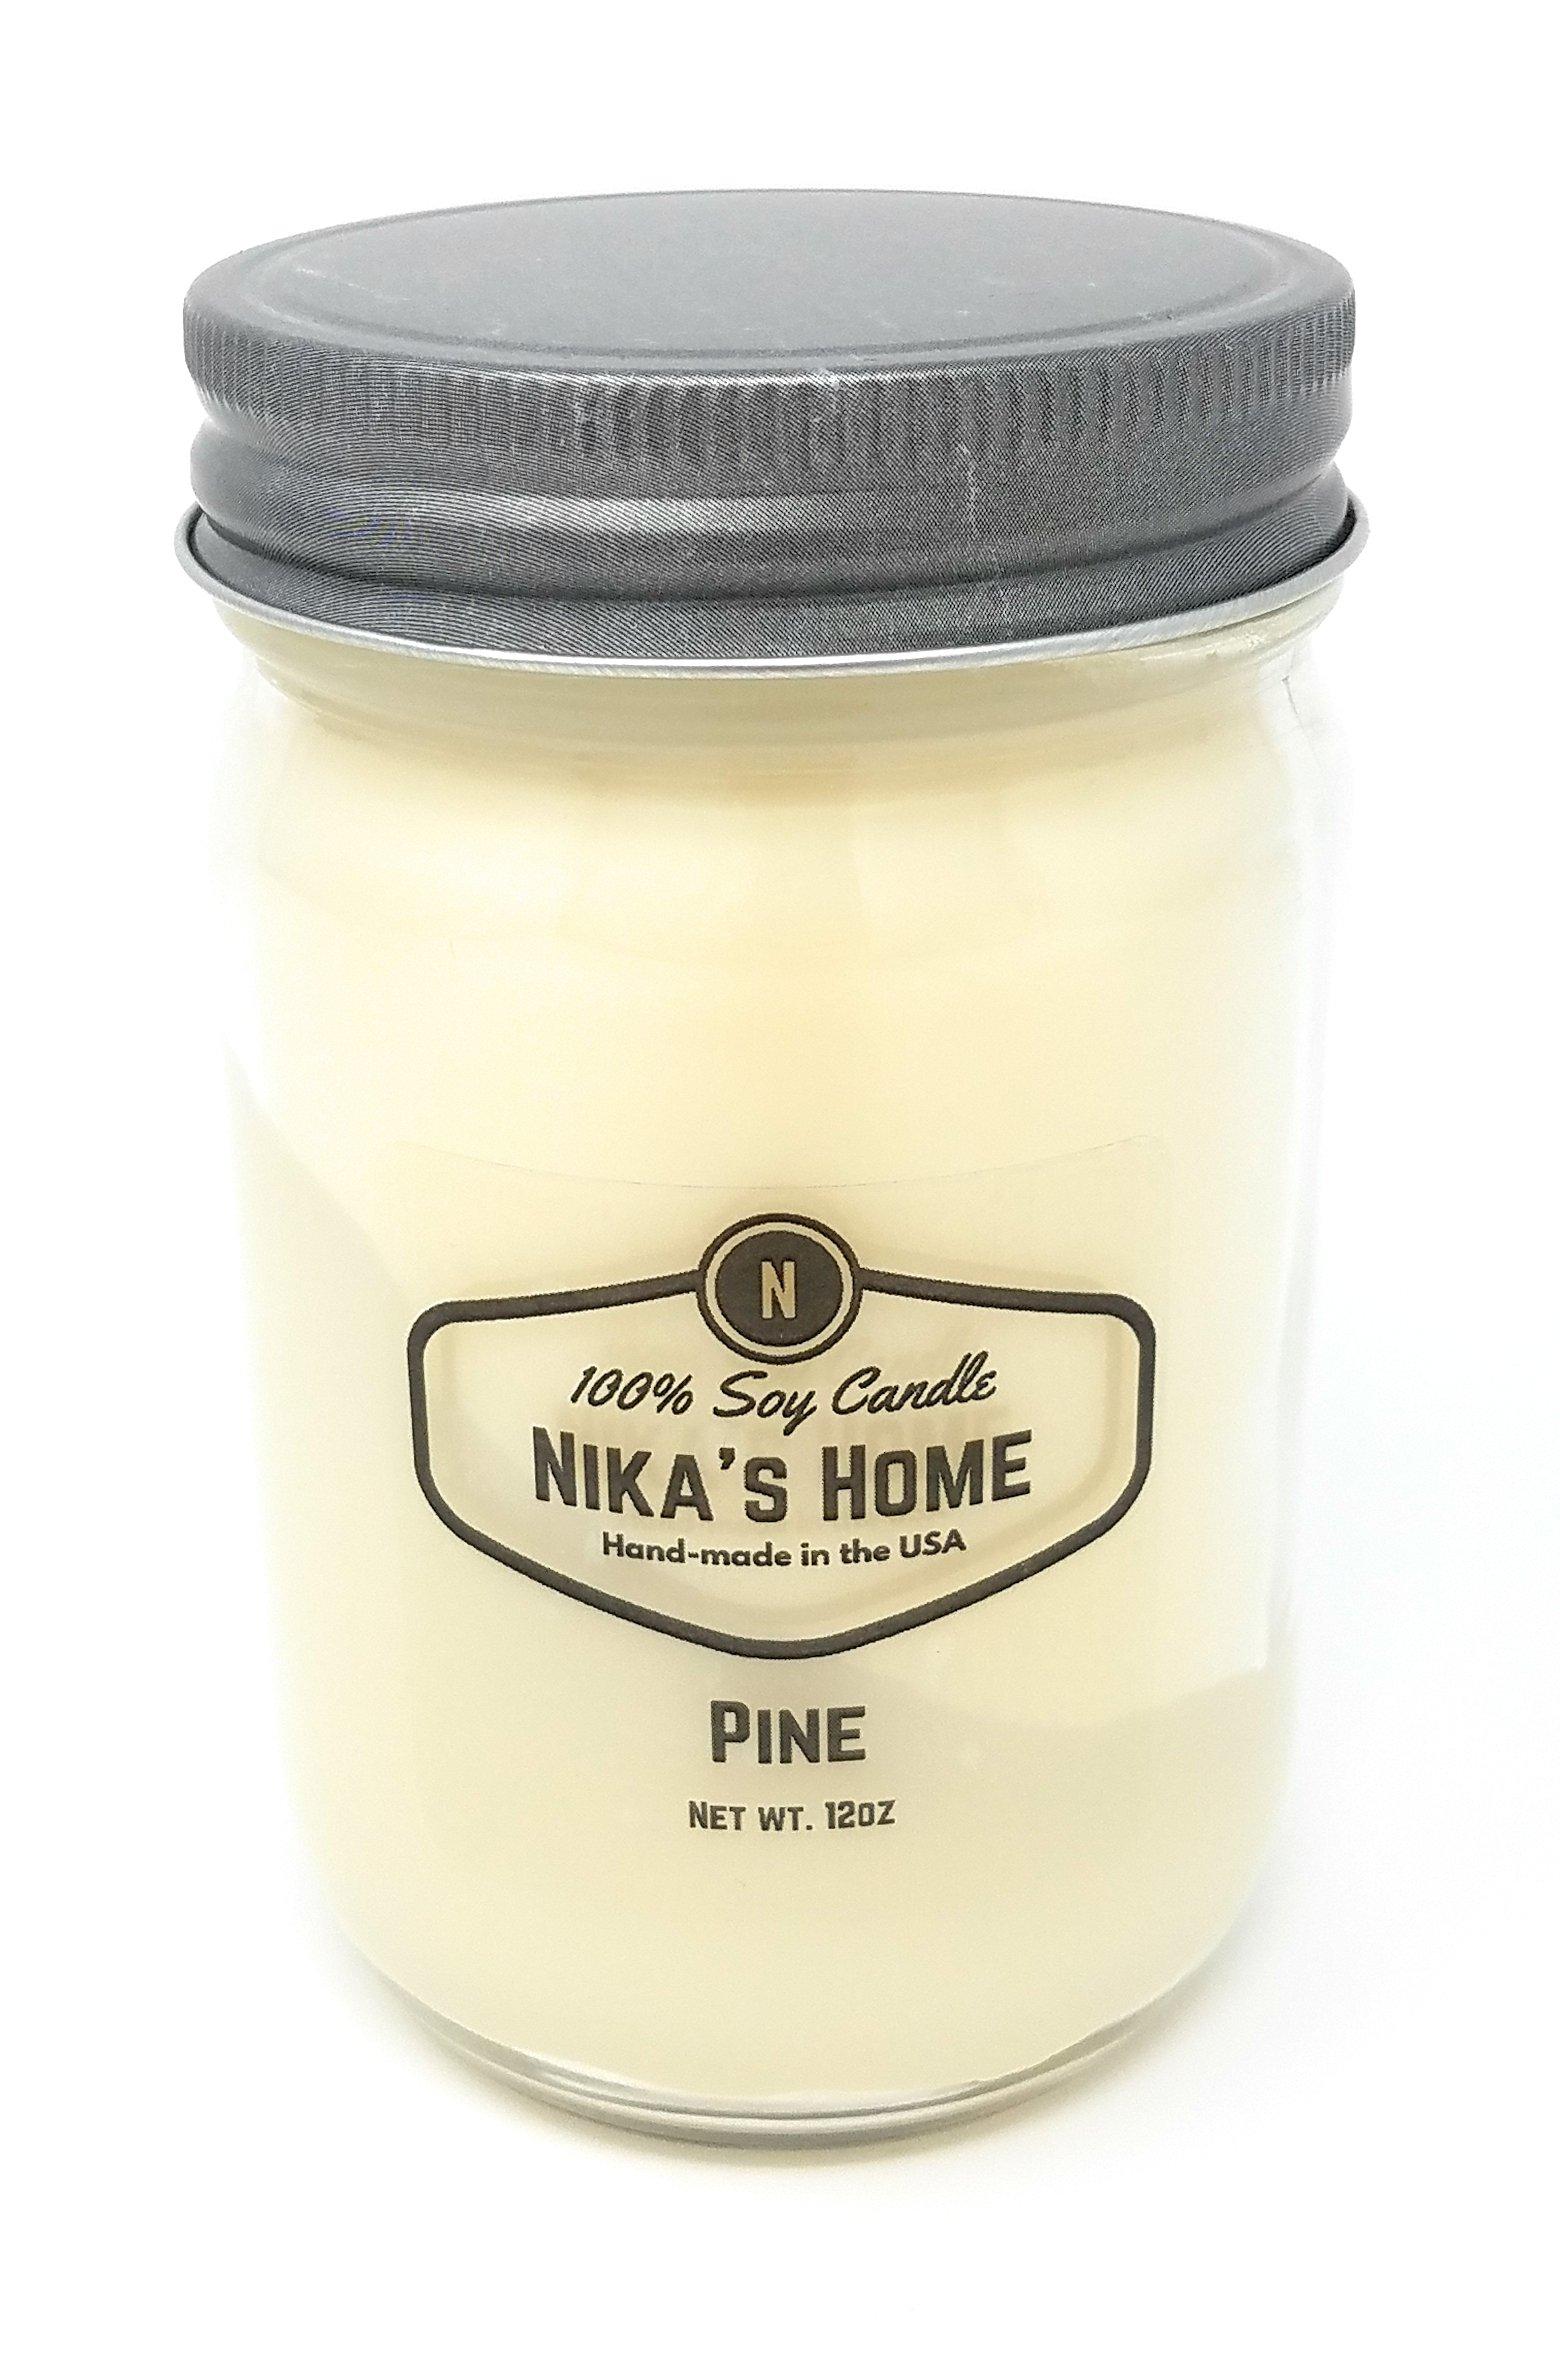 Nika's Home Pine Soy Candle - 12oz Mason Jar